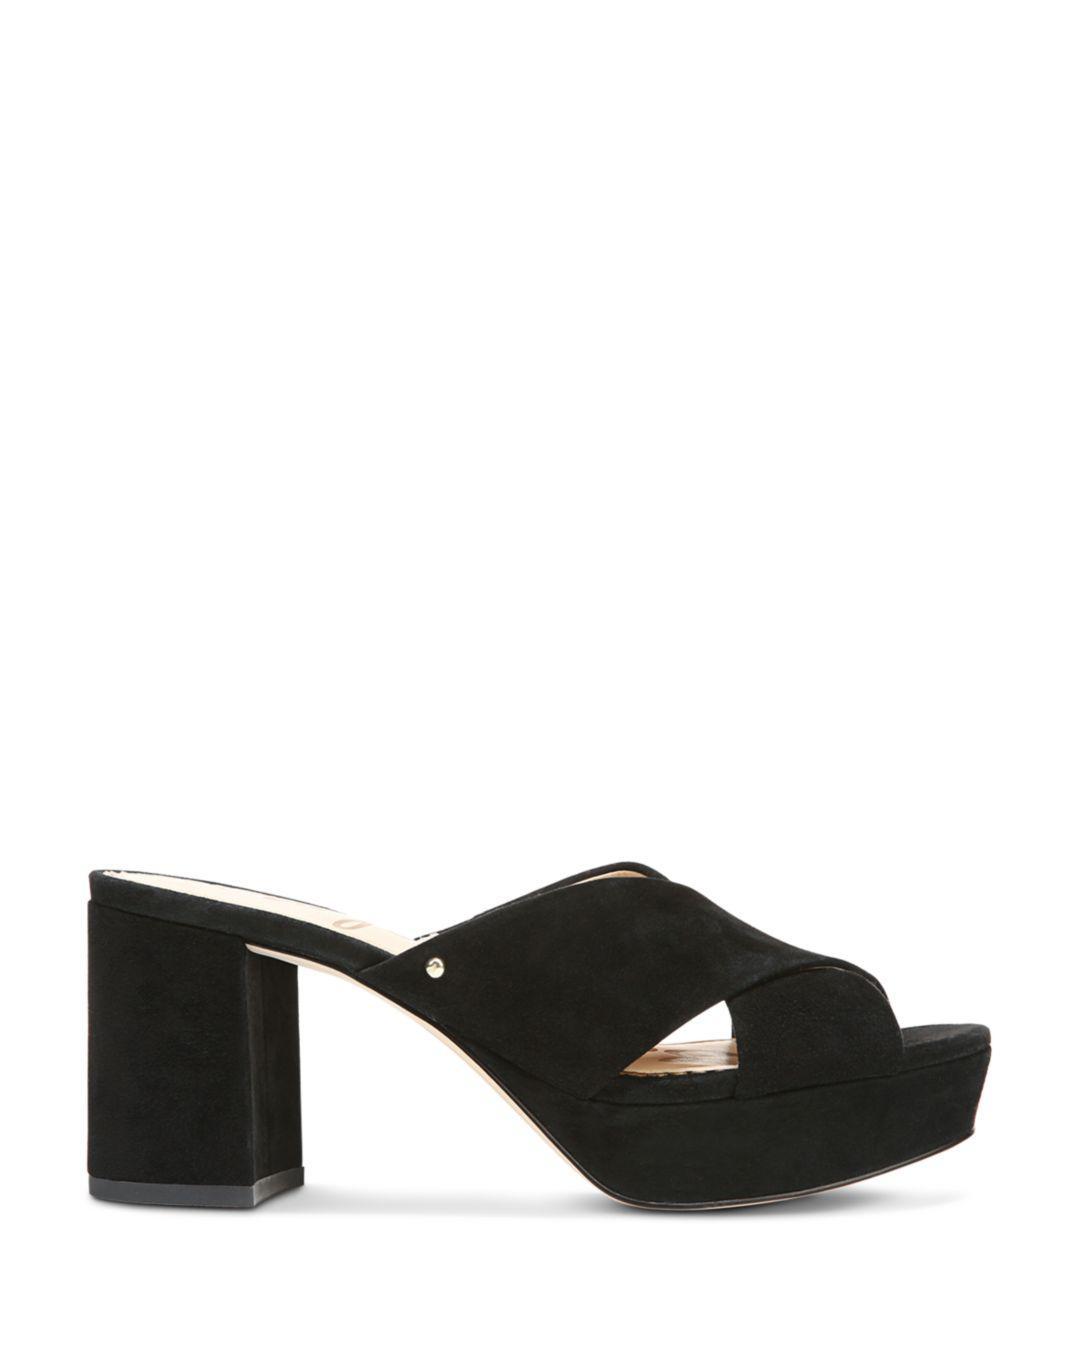 300ed1e9f1694a Lyst - Sam Edelman Women s Jayne Suede Platform High-heel Slide ...